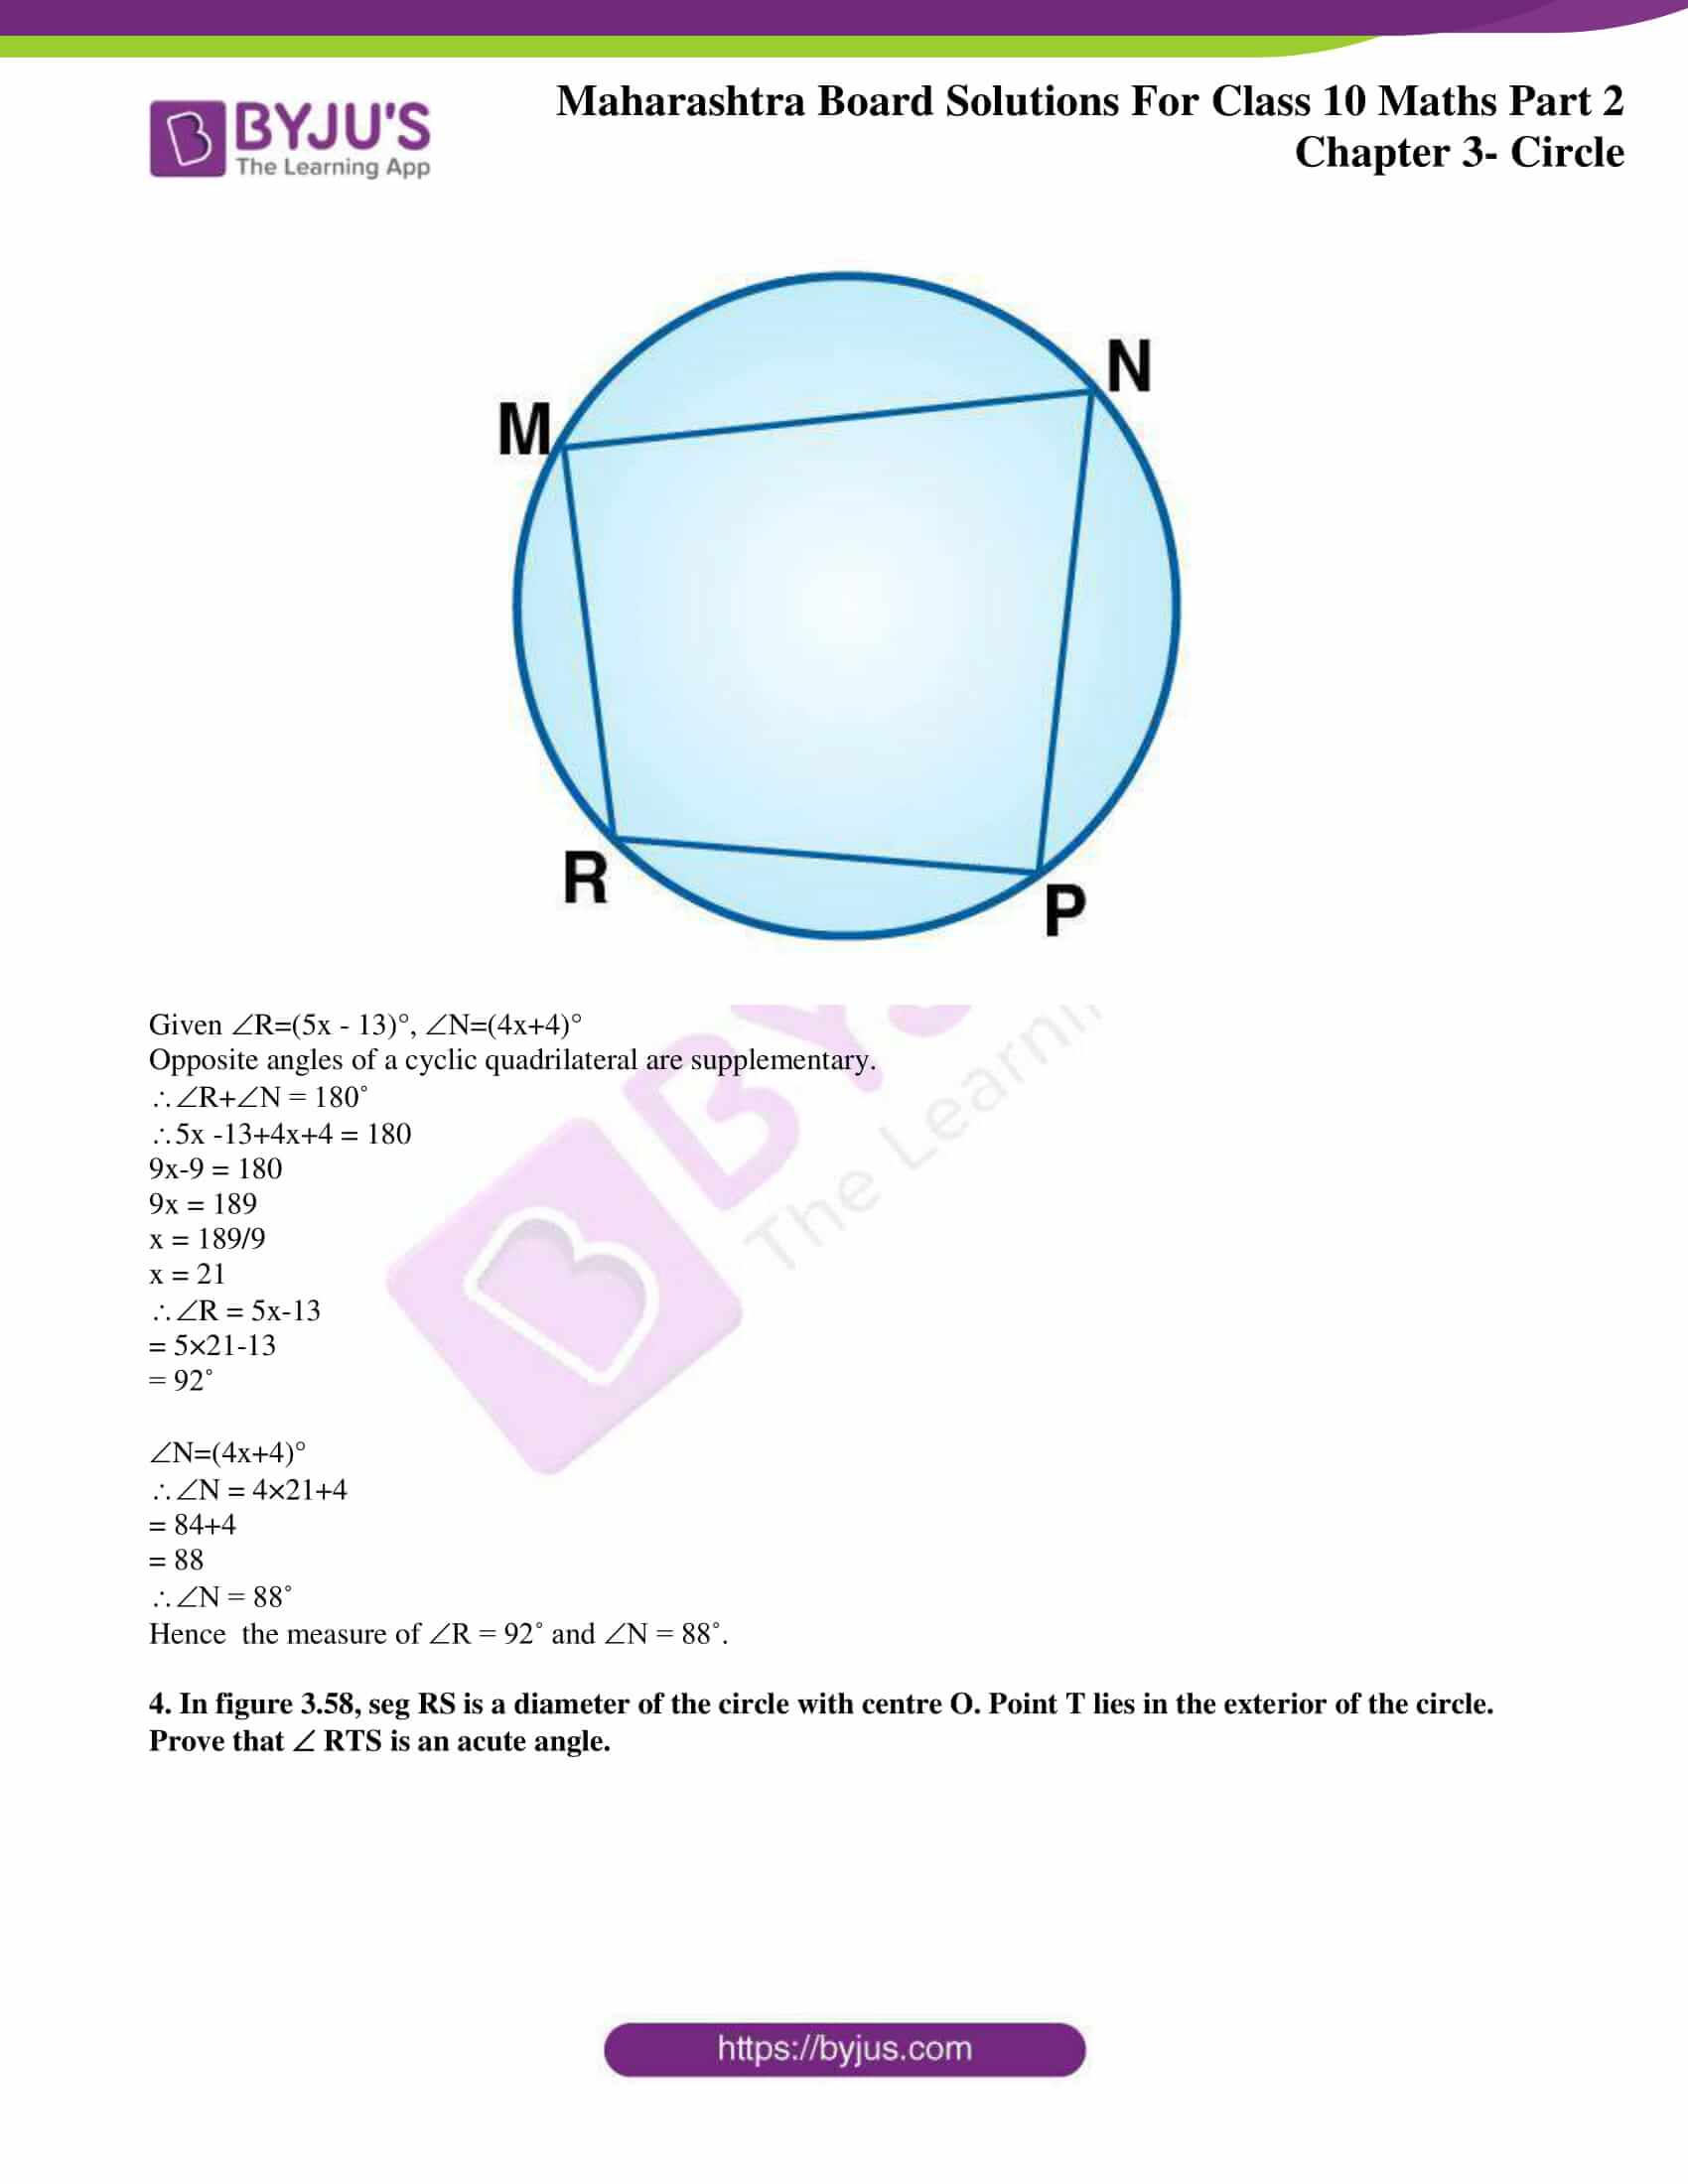 msbshse sol class 10 maths part 2 chapter 3 11